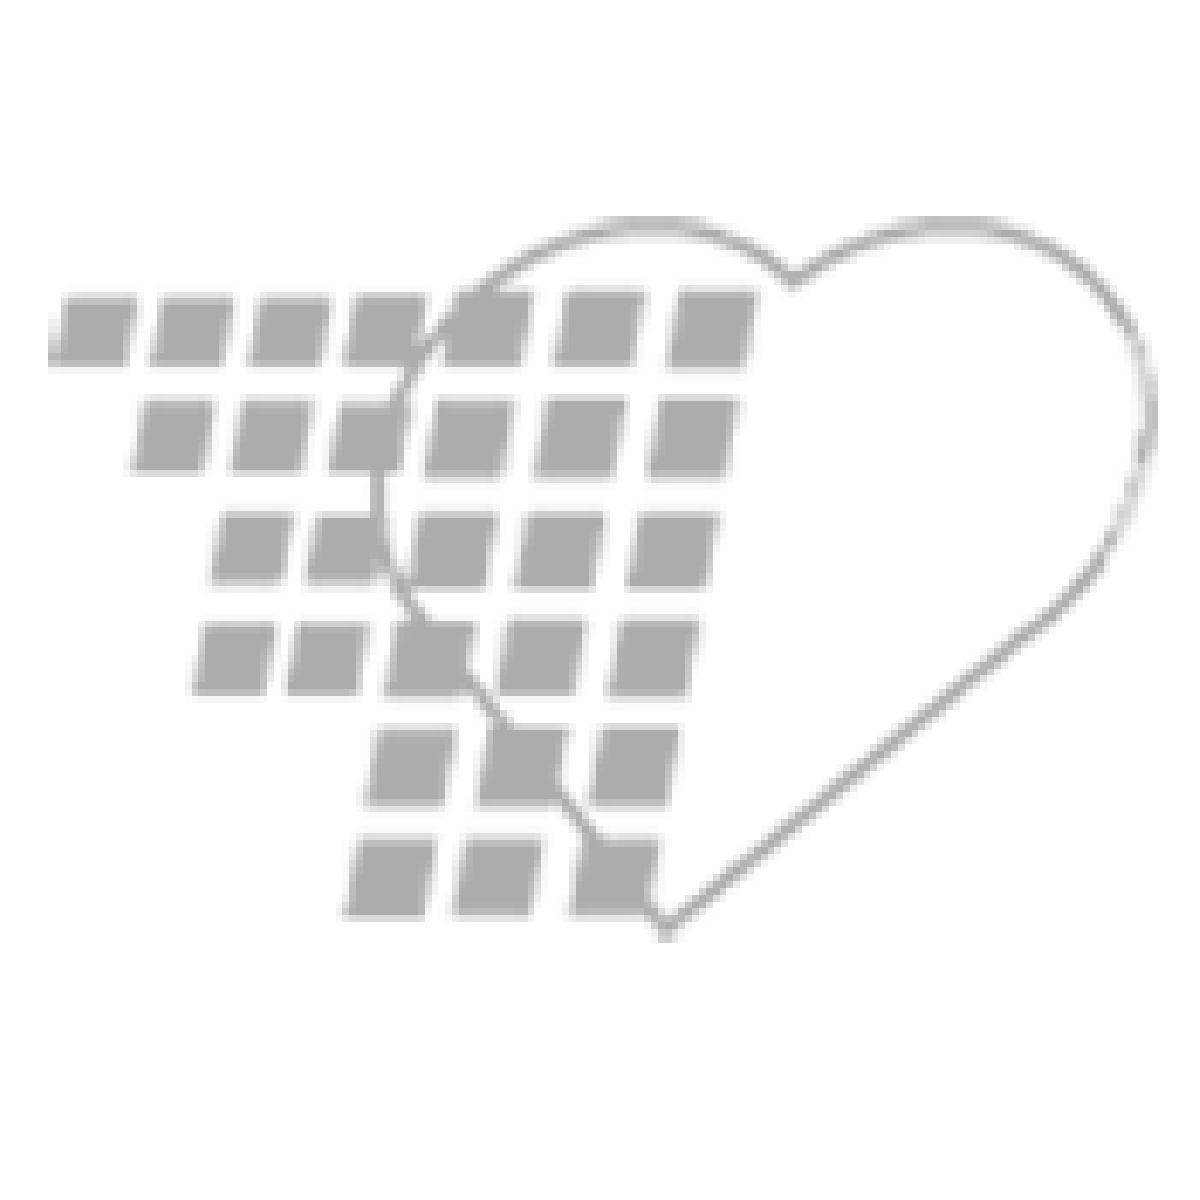 02-73-352 - Metalite Reusable Penlight - White